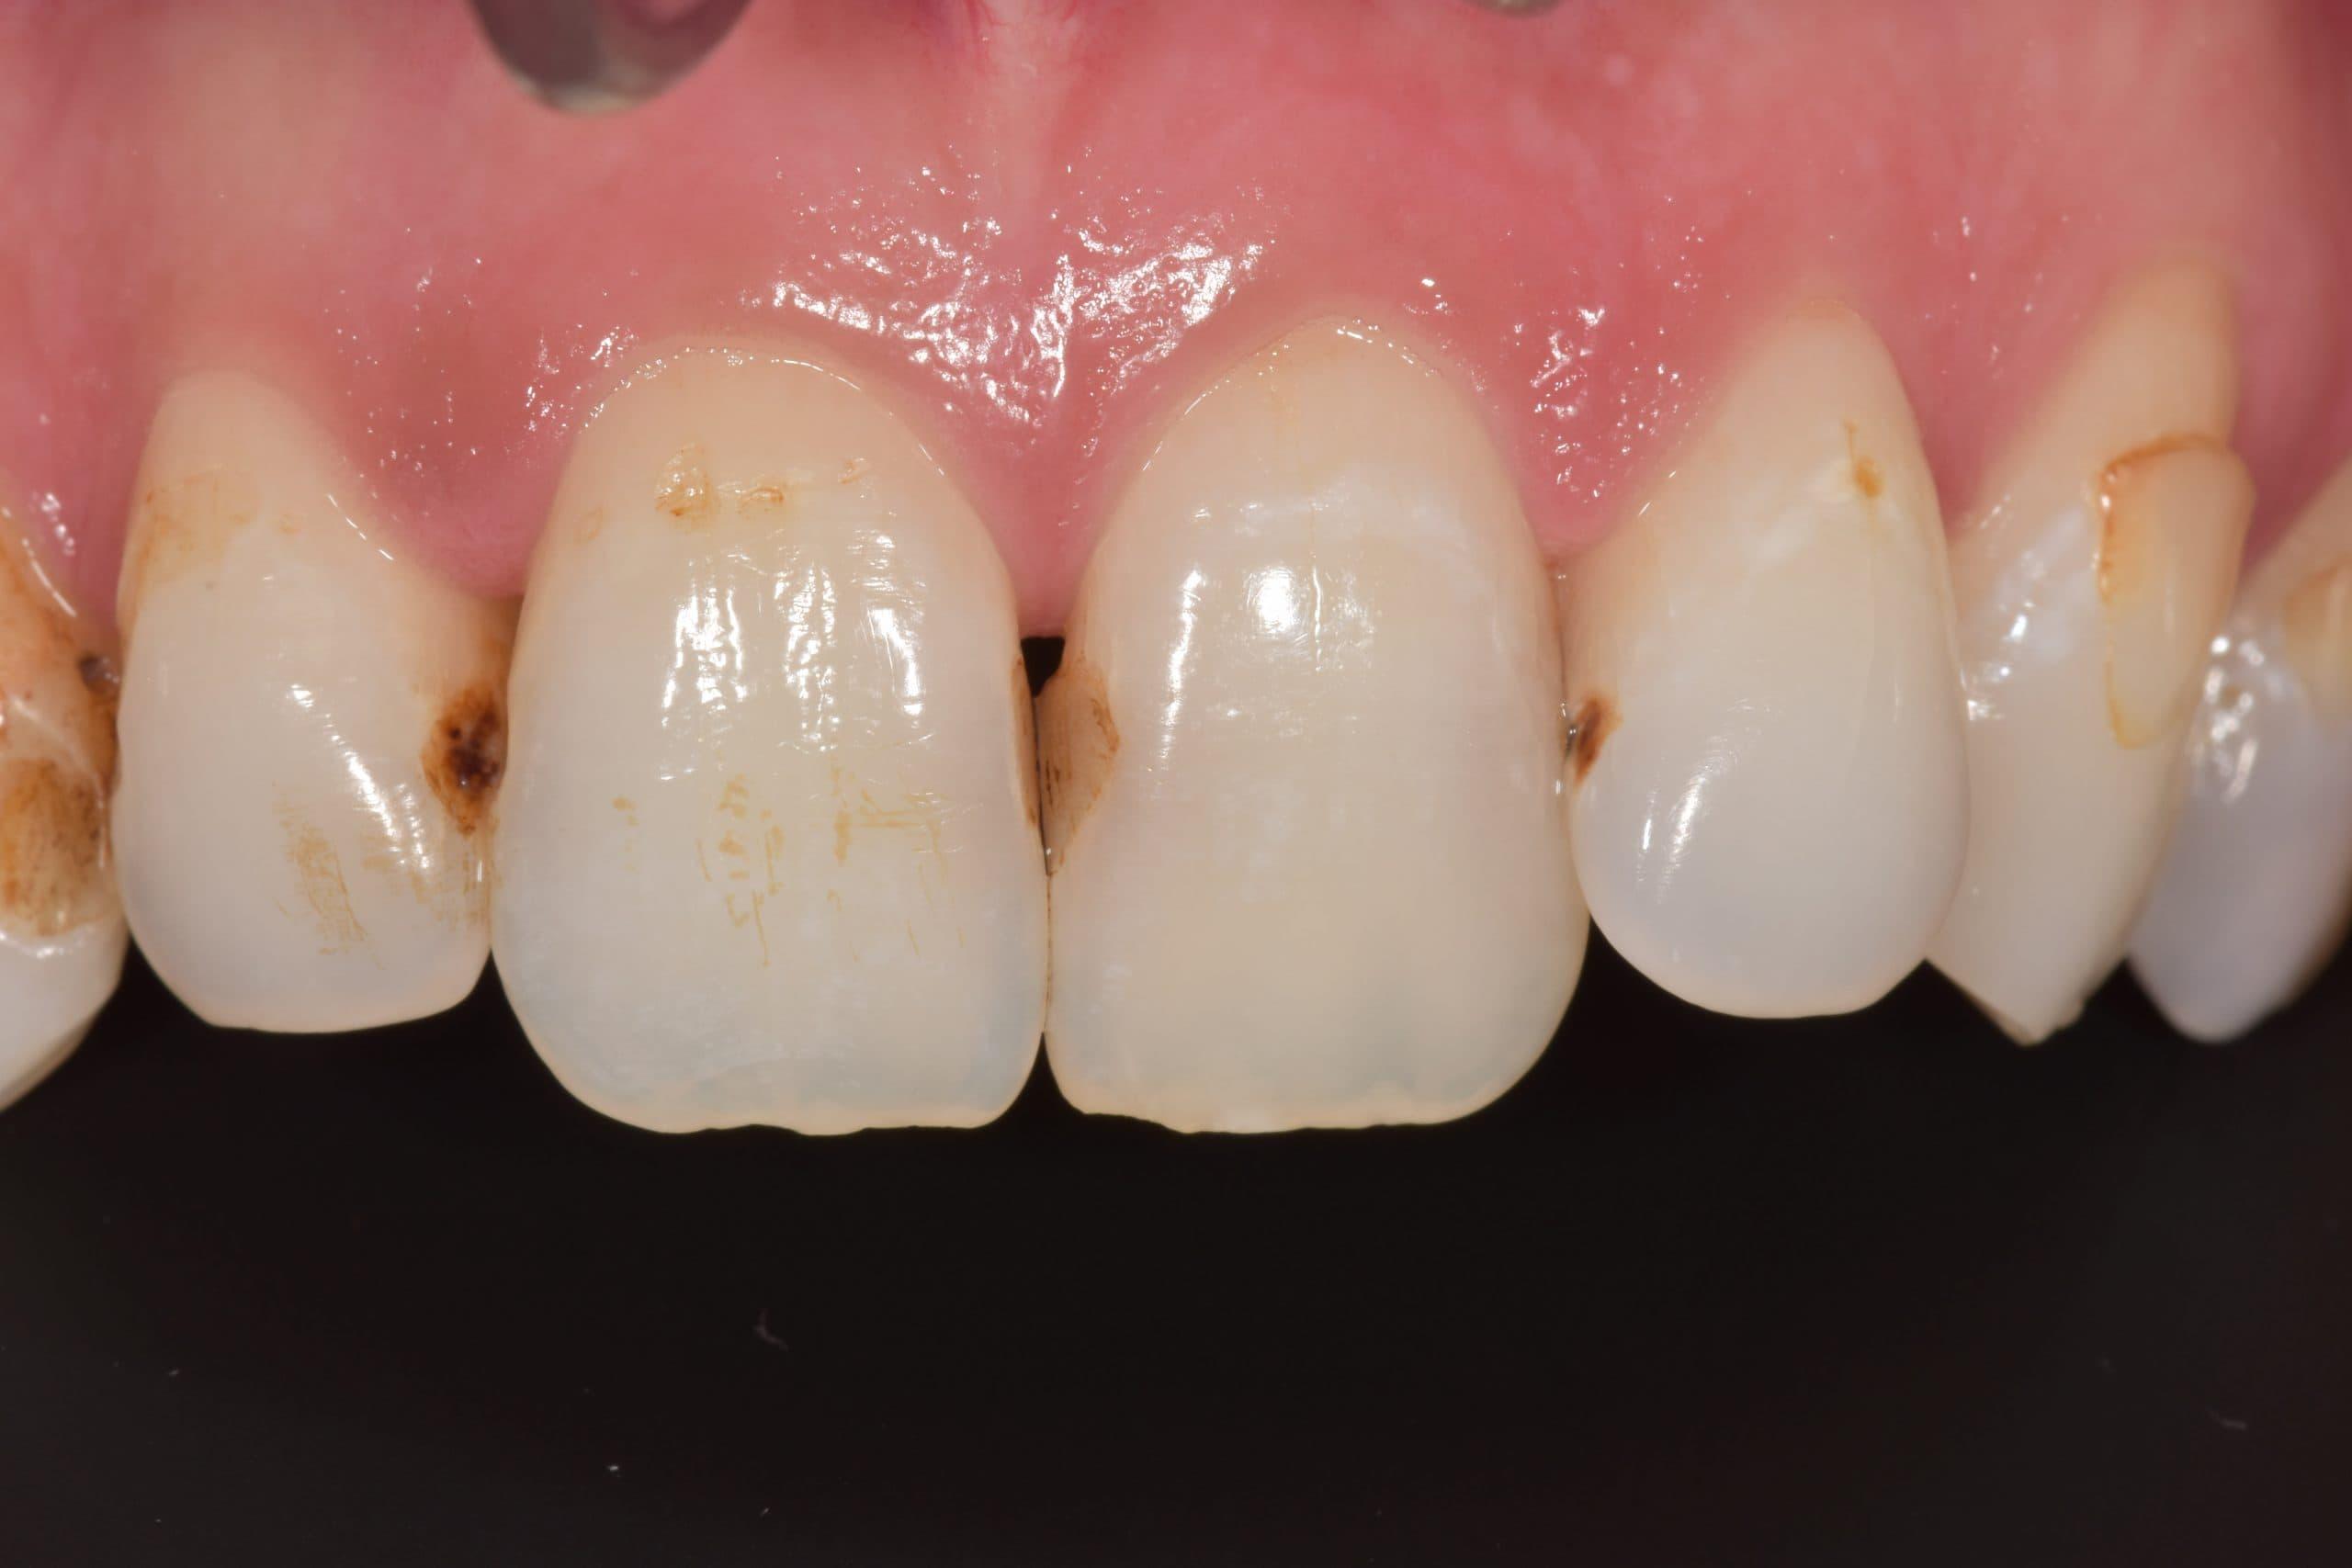 lichfield dental clinic composite bonding